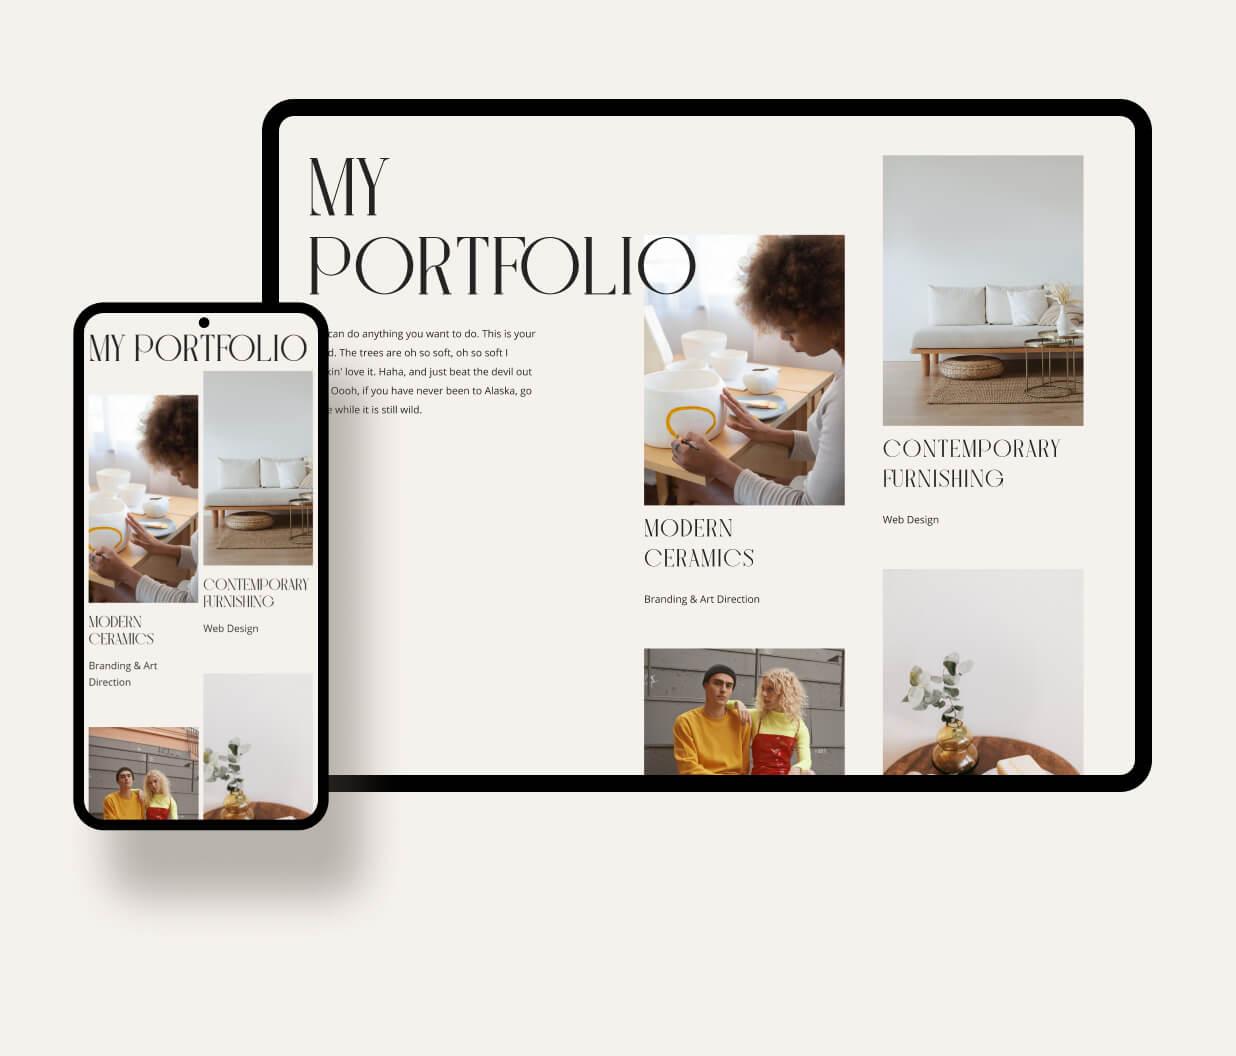 A mockup od a webpage for a portfolio page